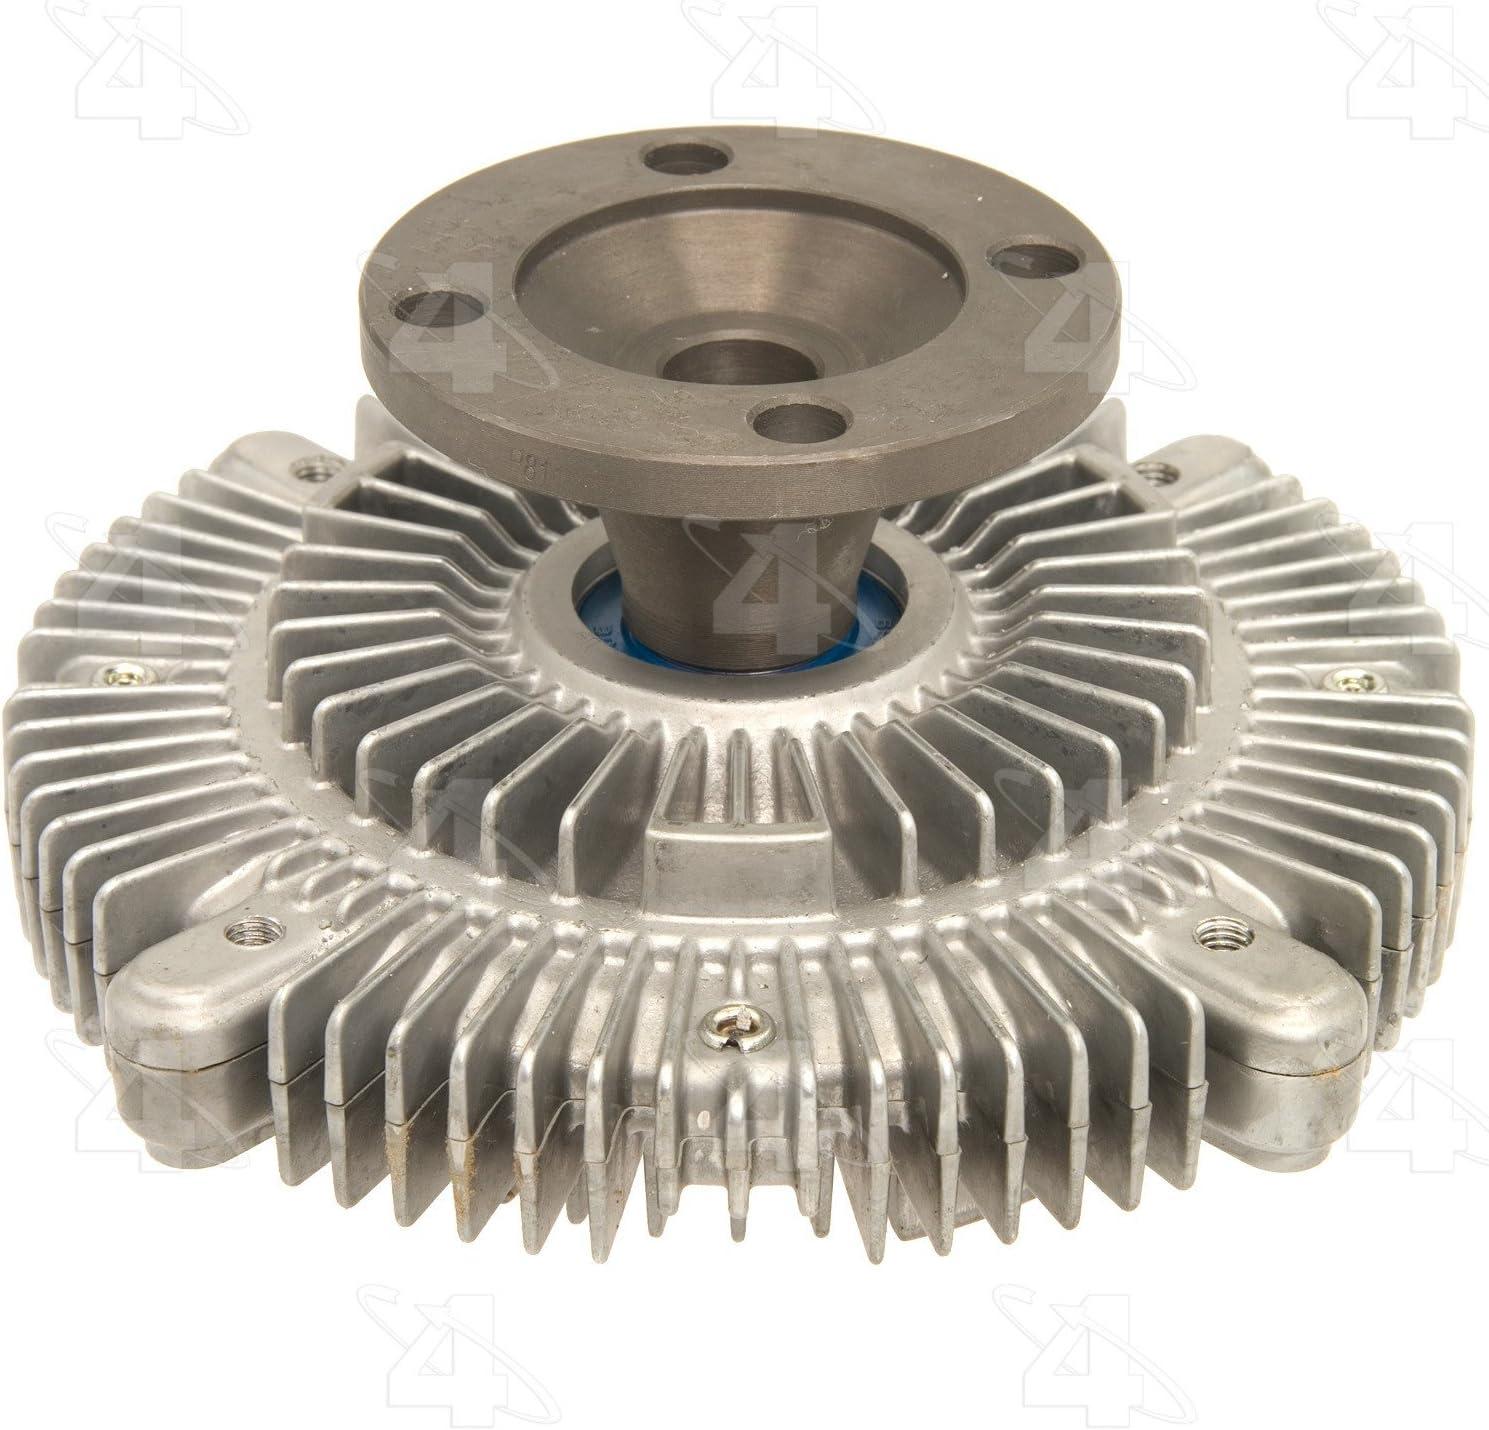 4-Seasons Four-Seasons Fan Clutch Radiator Cooling New for 36773